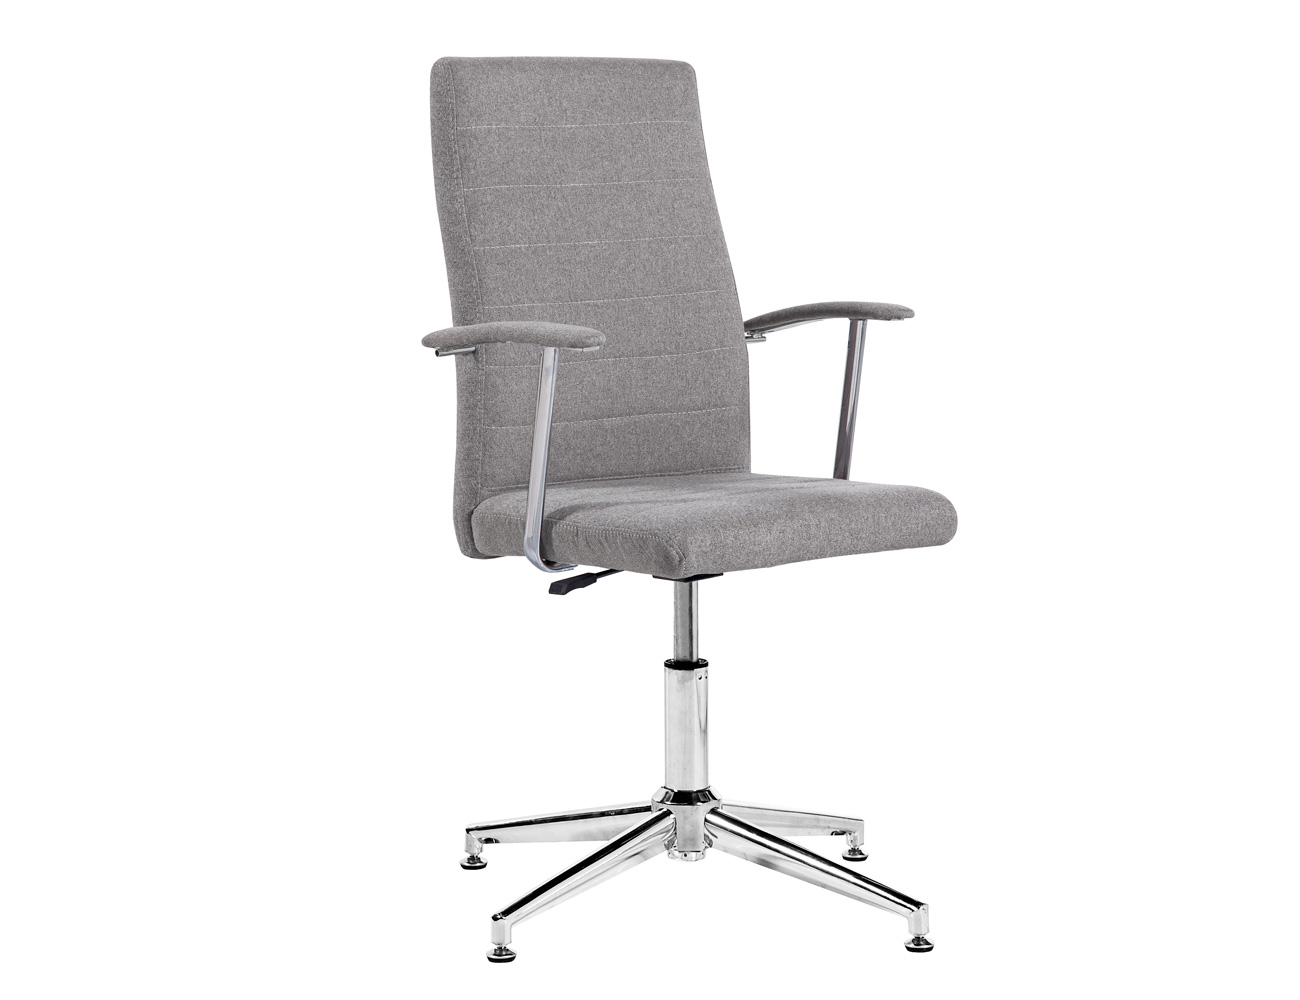 Silla oficina despecho elevable altura apoya brazos gris ceniza